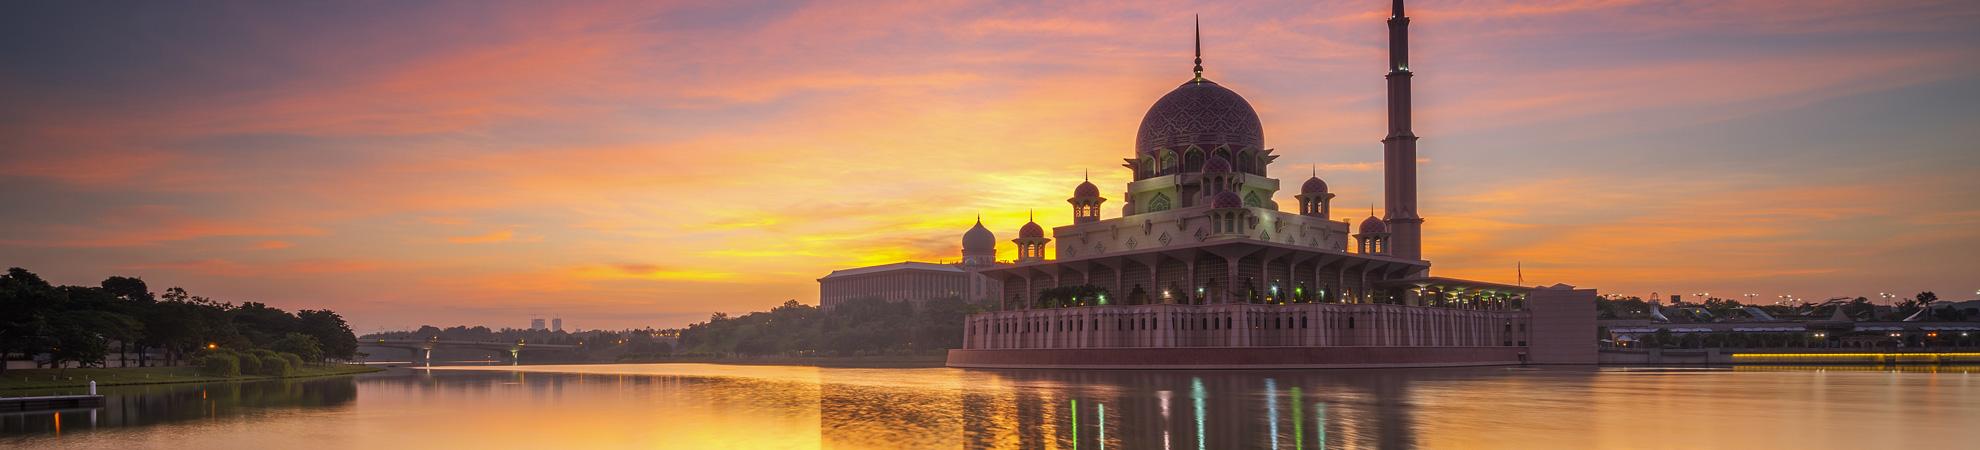 Voyage Malaisie tout compris